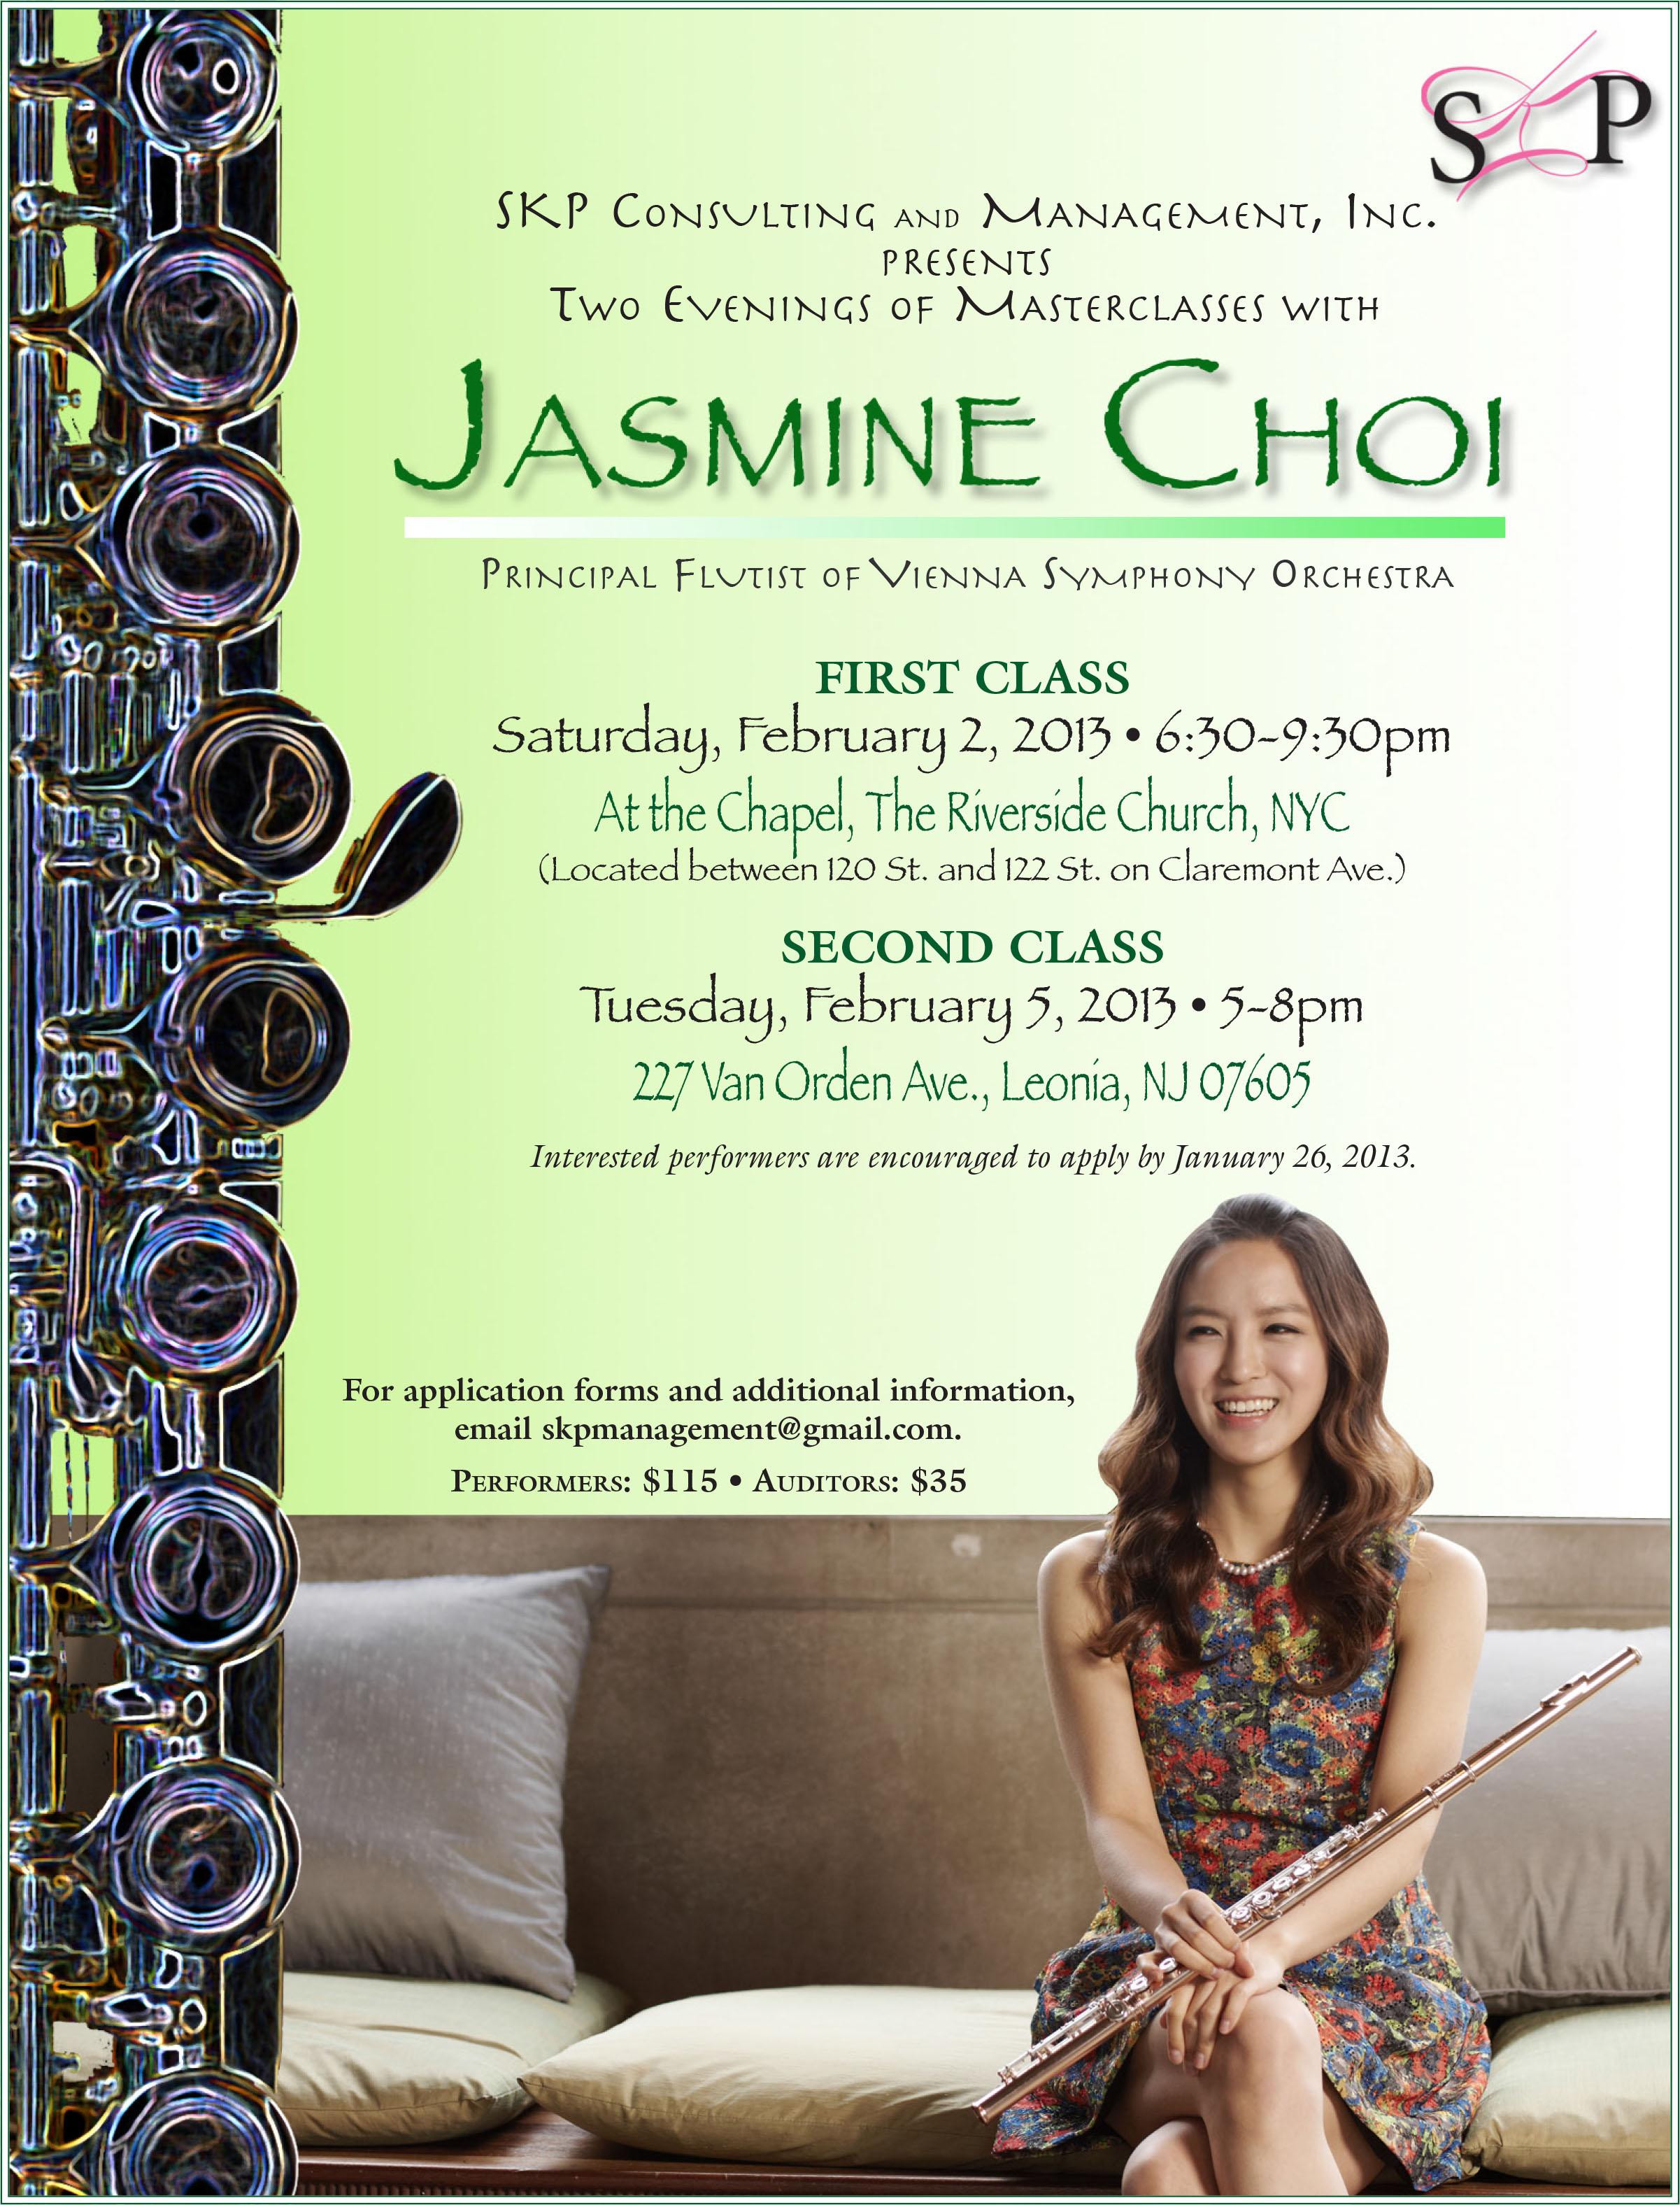 Jasmine Choi Flyer B.jpg